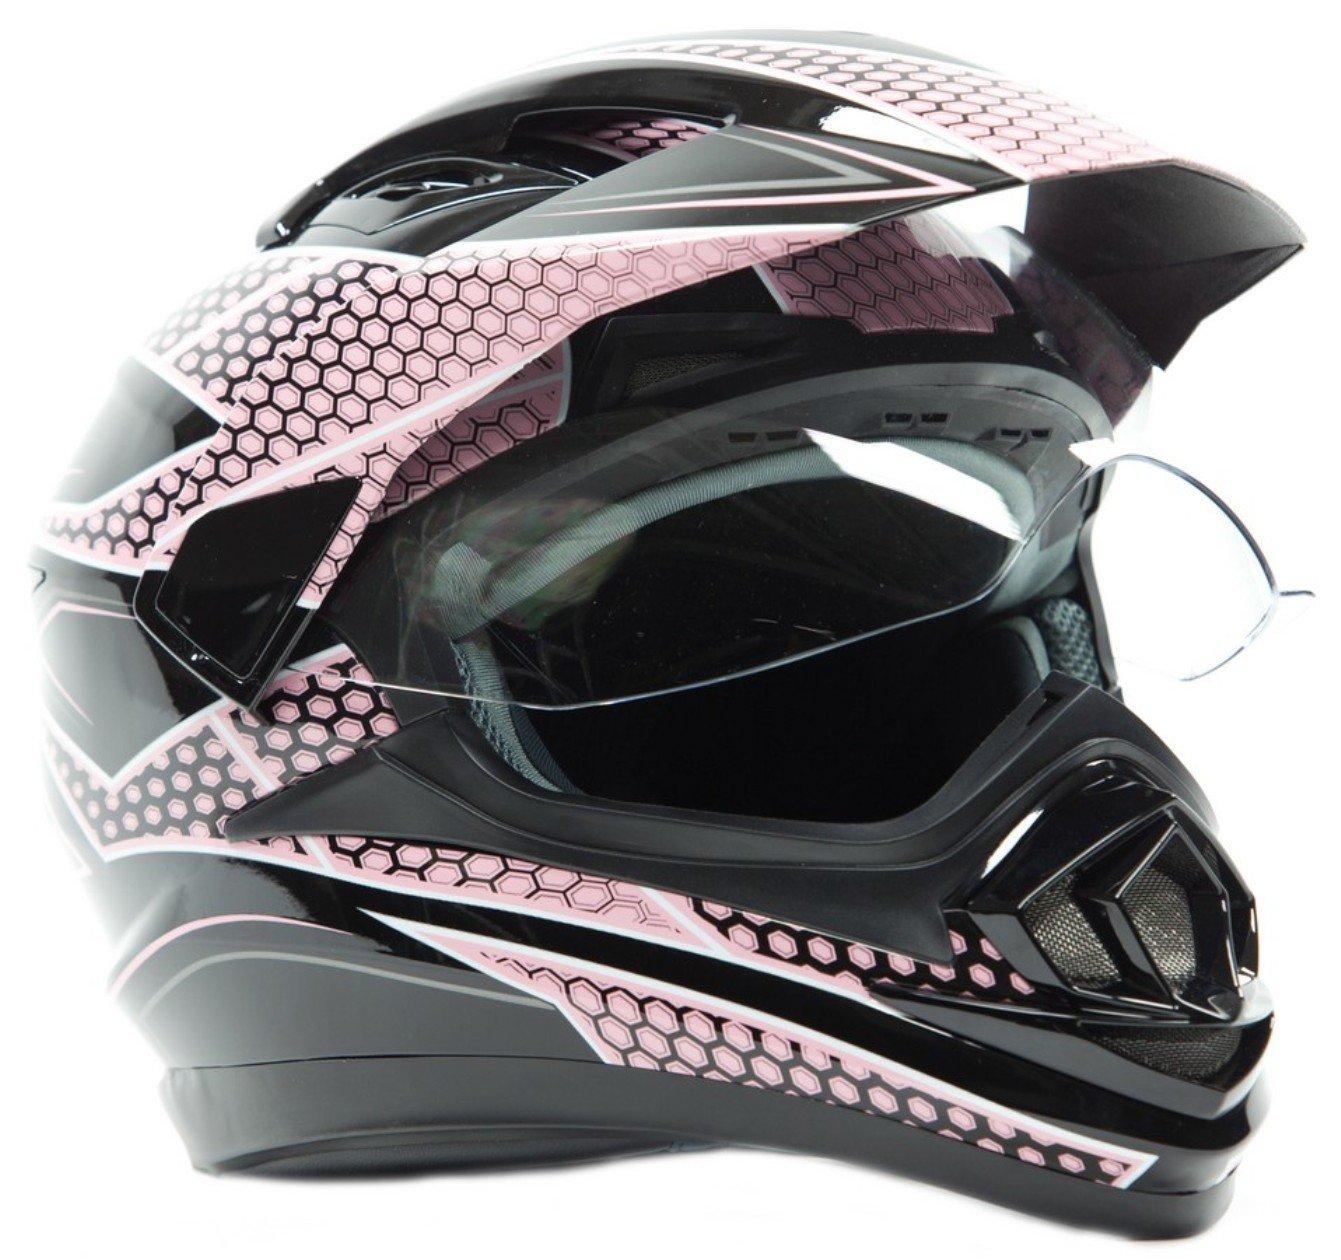 Dual Sport Helmet - Off Road Motocross UTV ATV Motorcycle Enduro - Pink & Black - Large